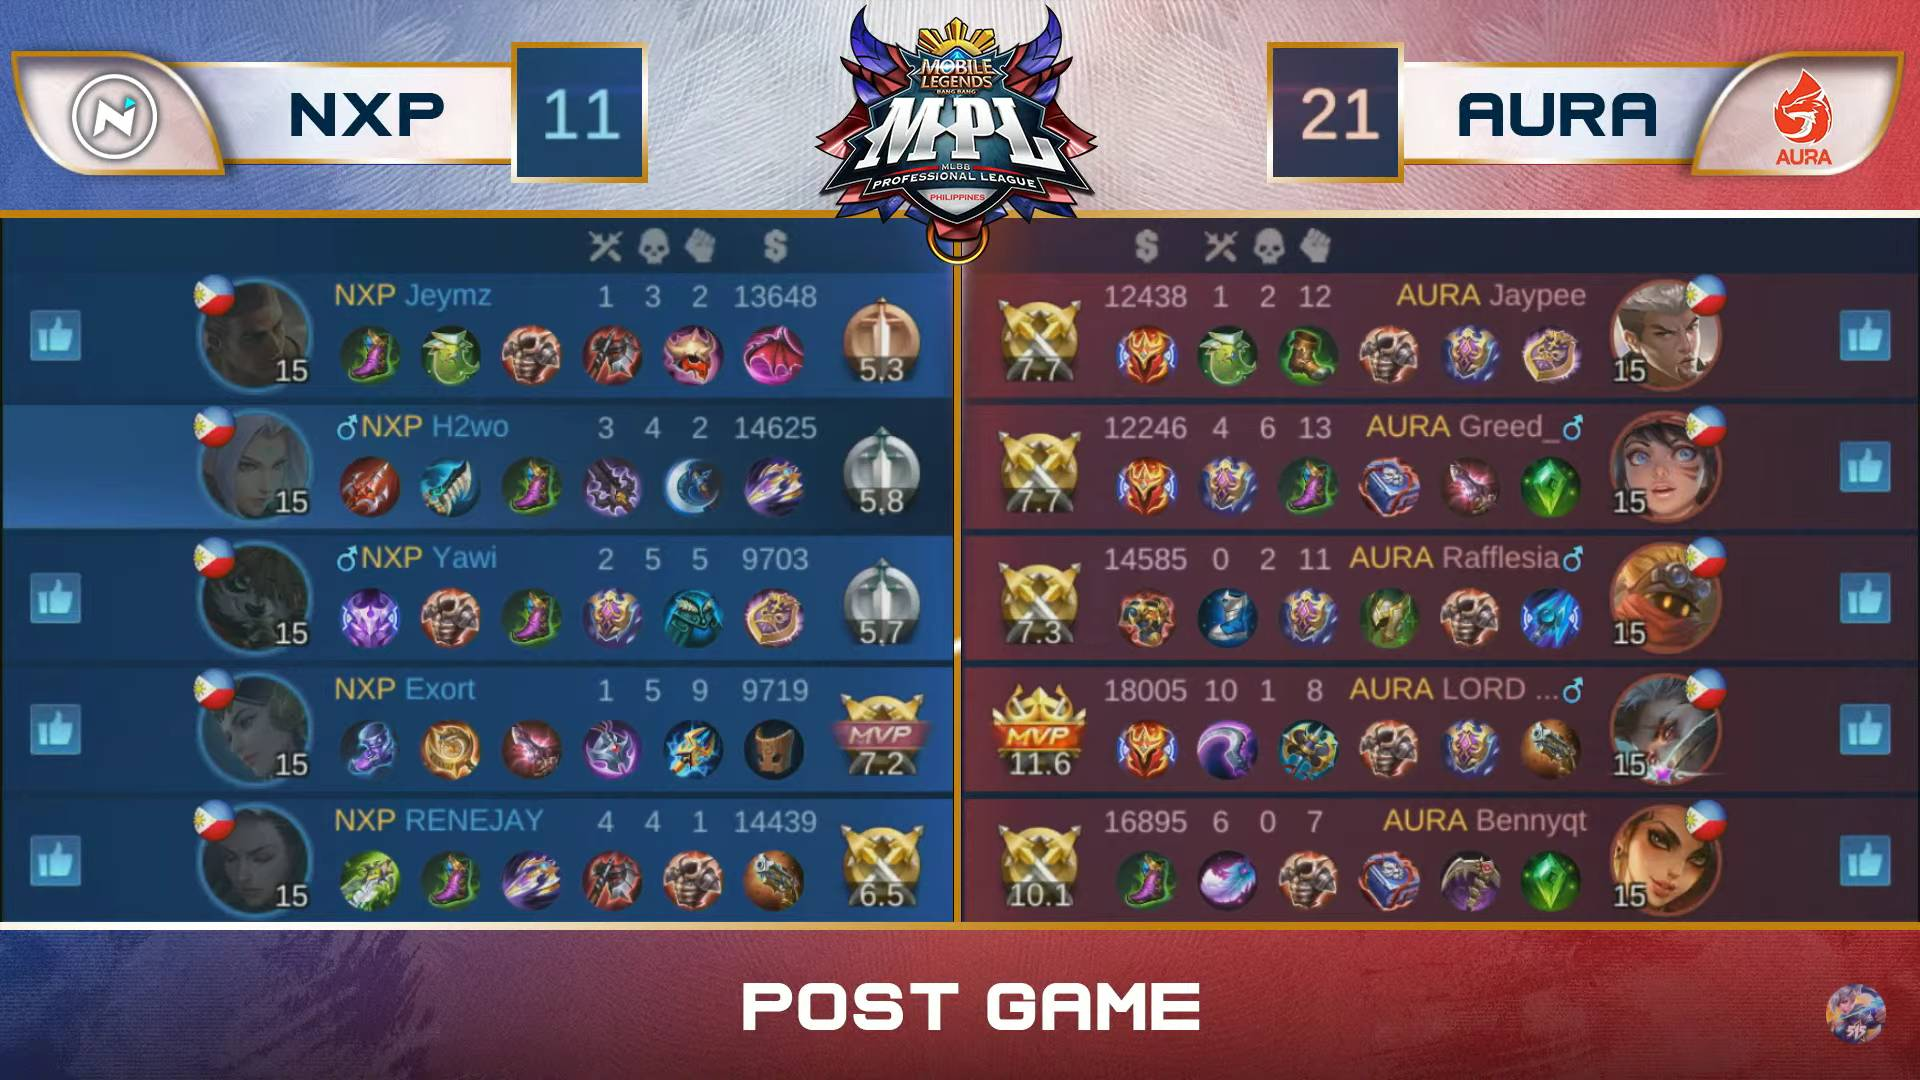 MPL-PH-Season-7-Aura-def-Nexplay-Game-1 Aura PH dispatches NXP, take top spot in MPL PH A ESports Mobile Legends MPL-PH News  - philippine sports news